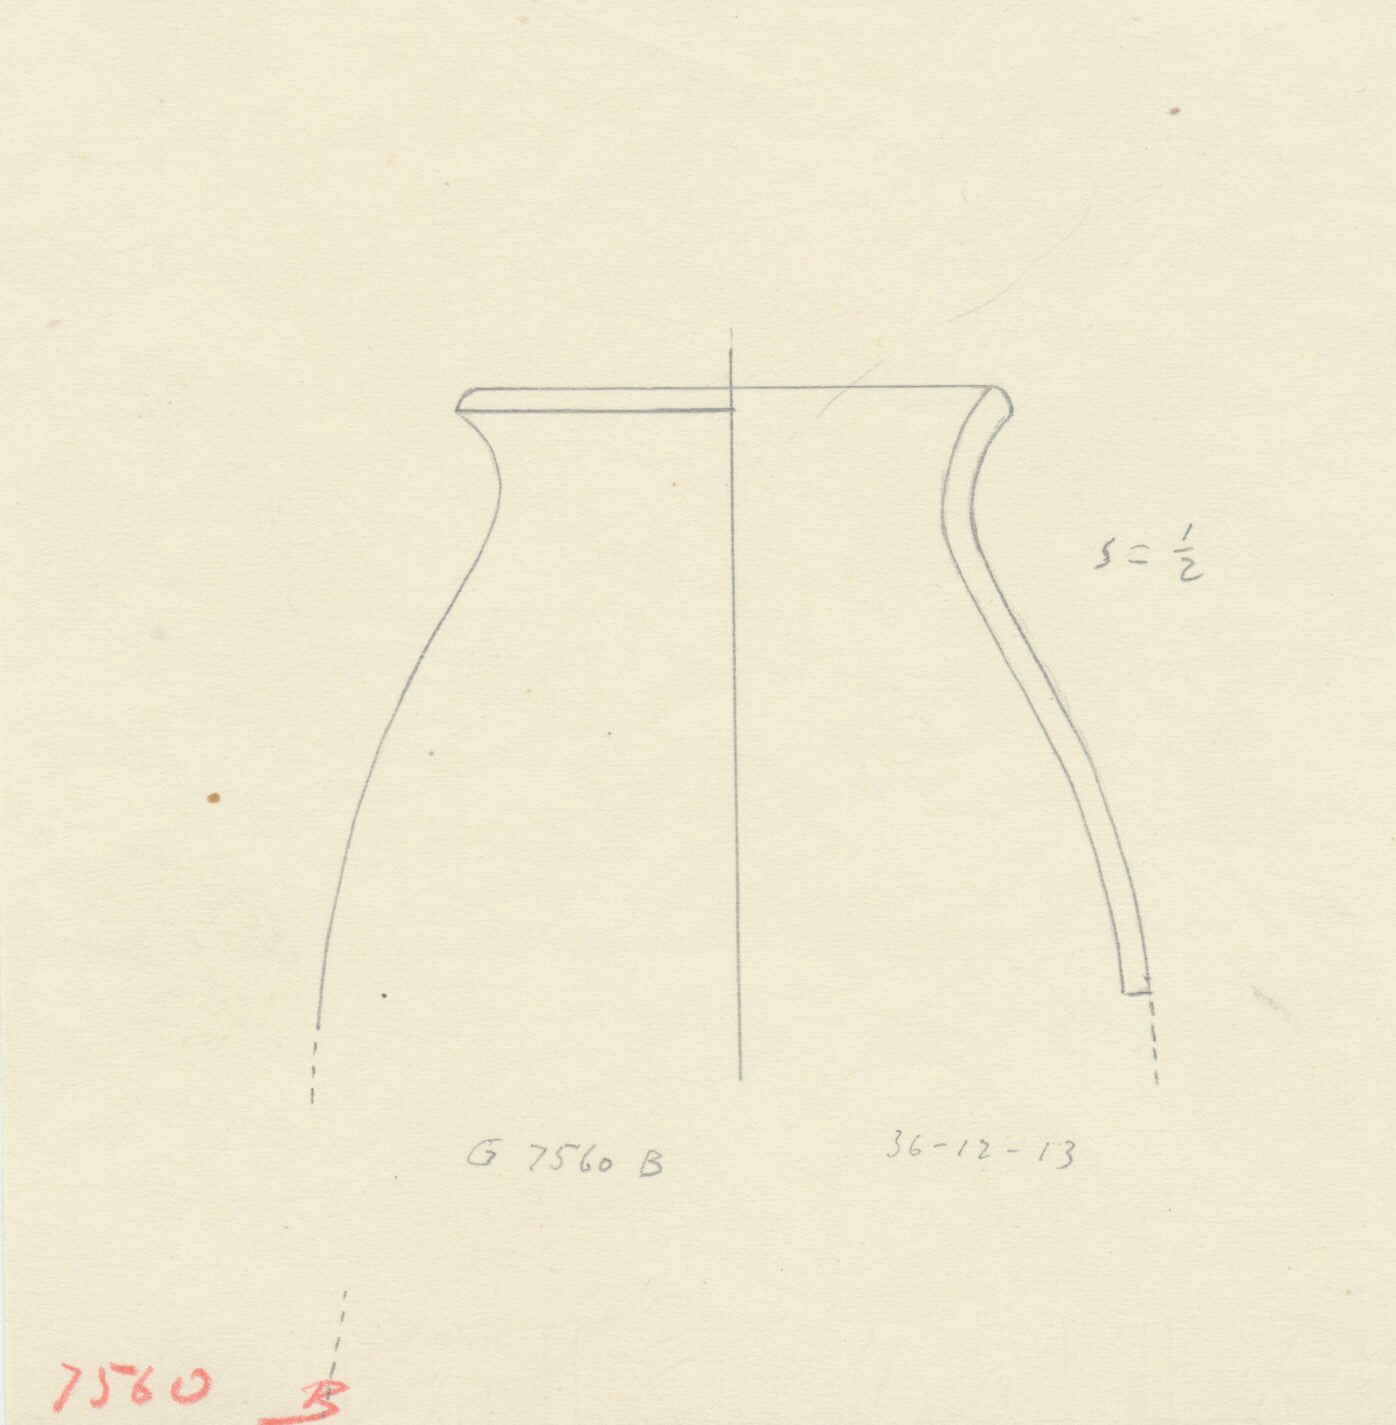 Drawings: G 7560, Shaft B: pottery, jar